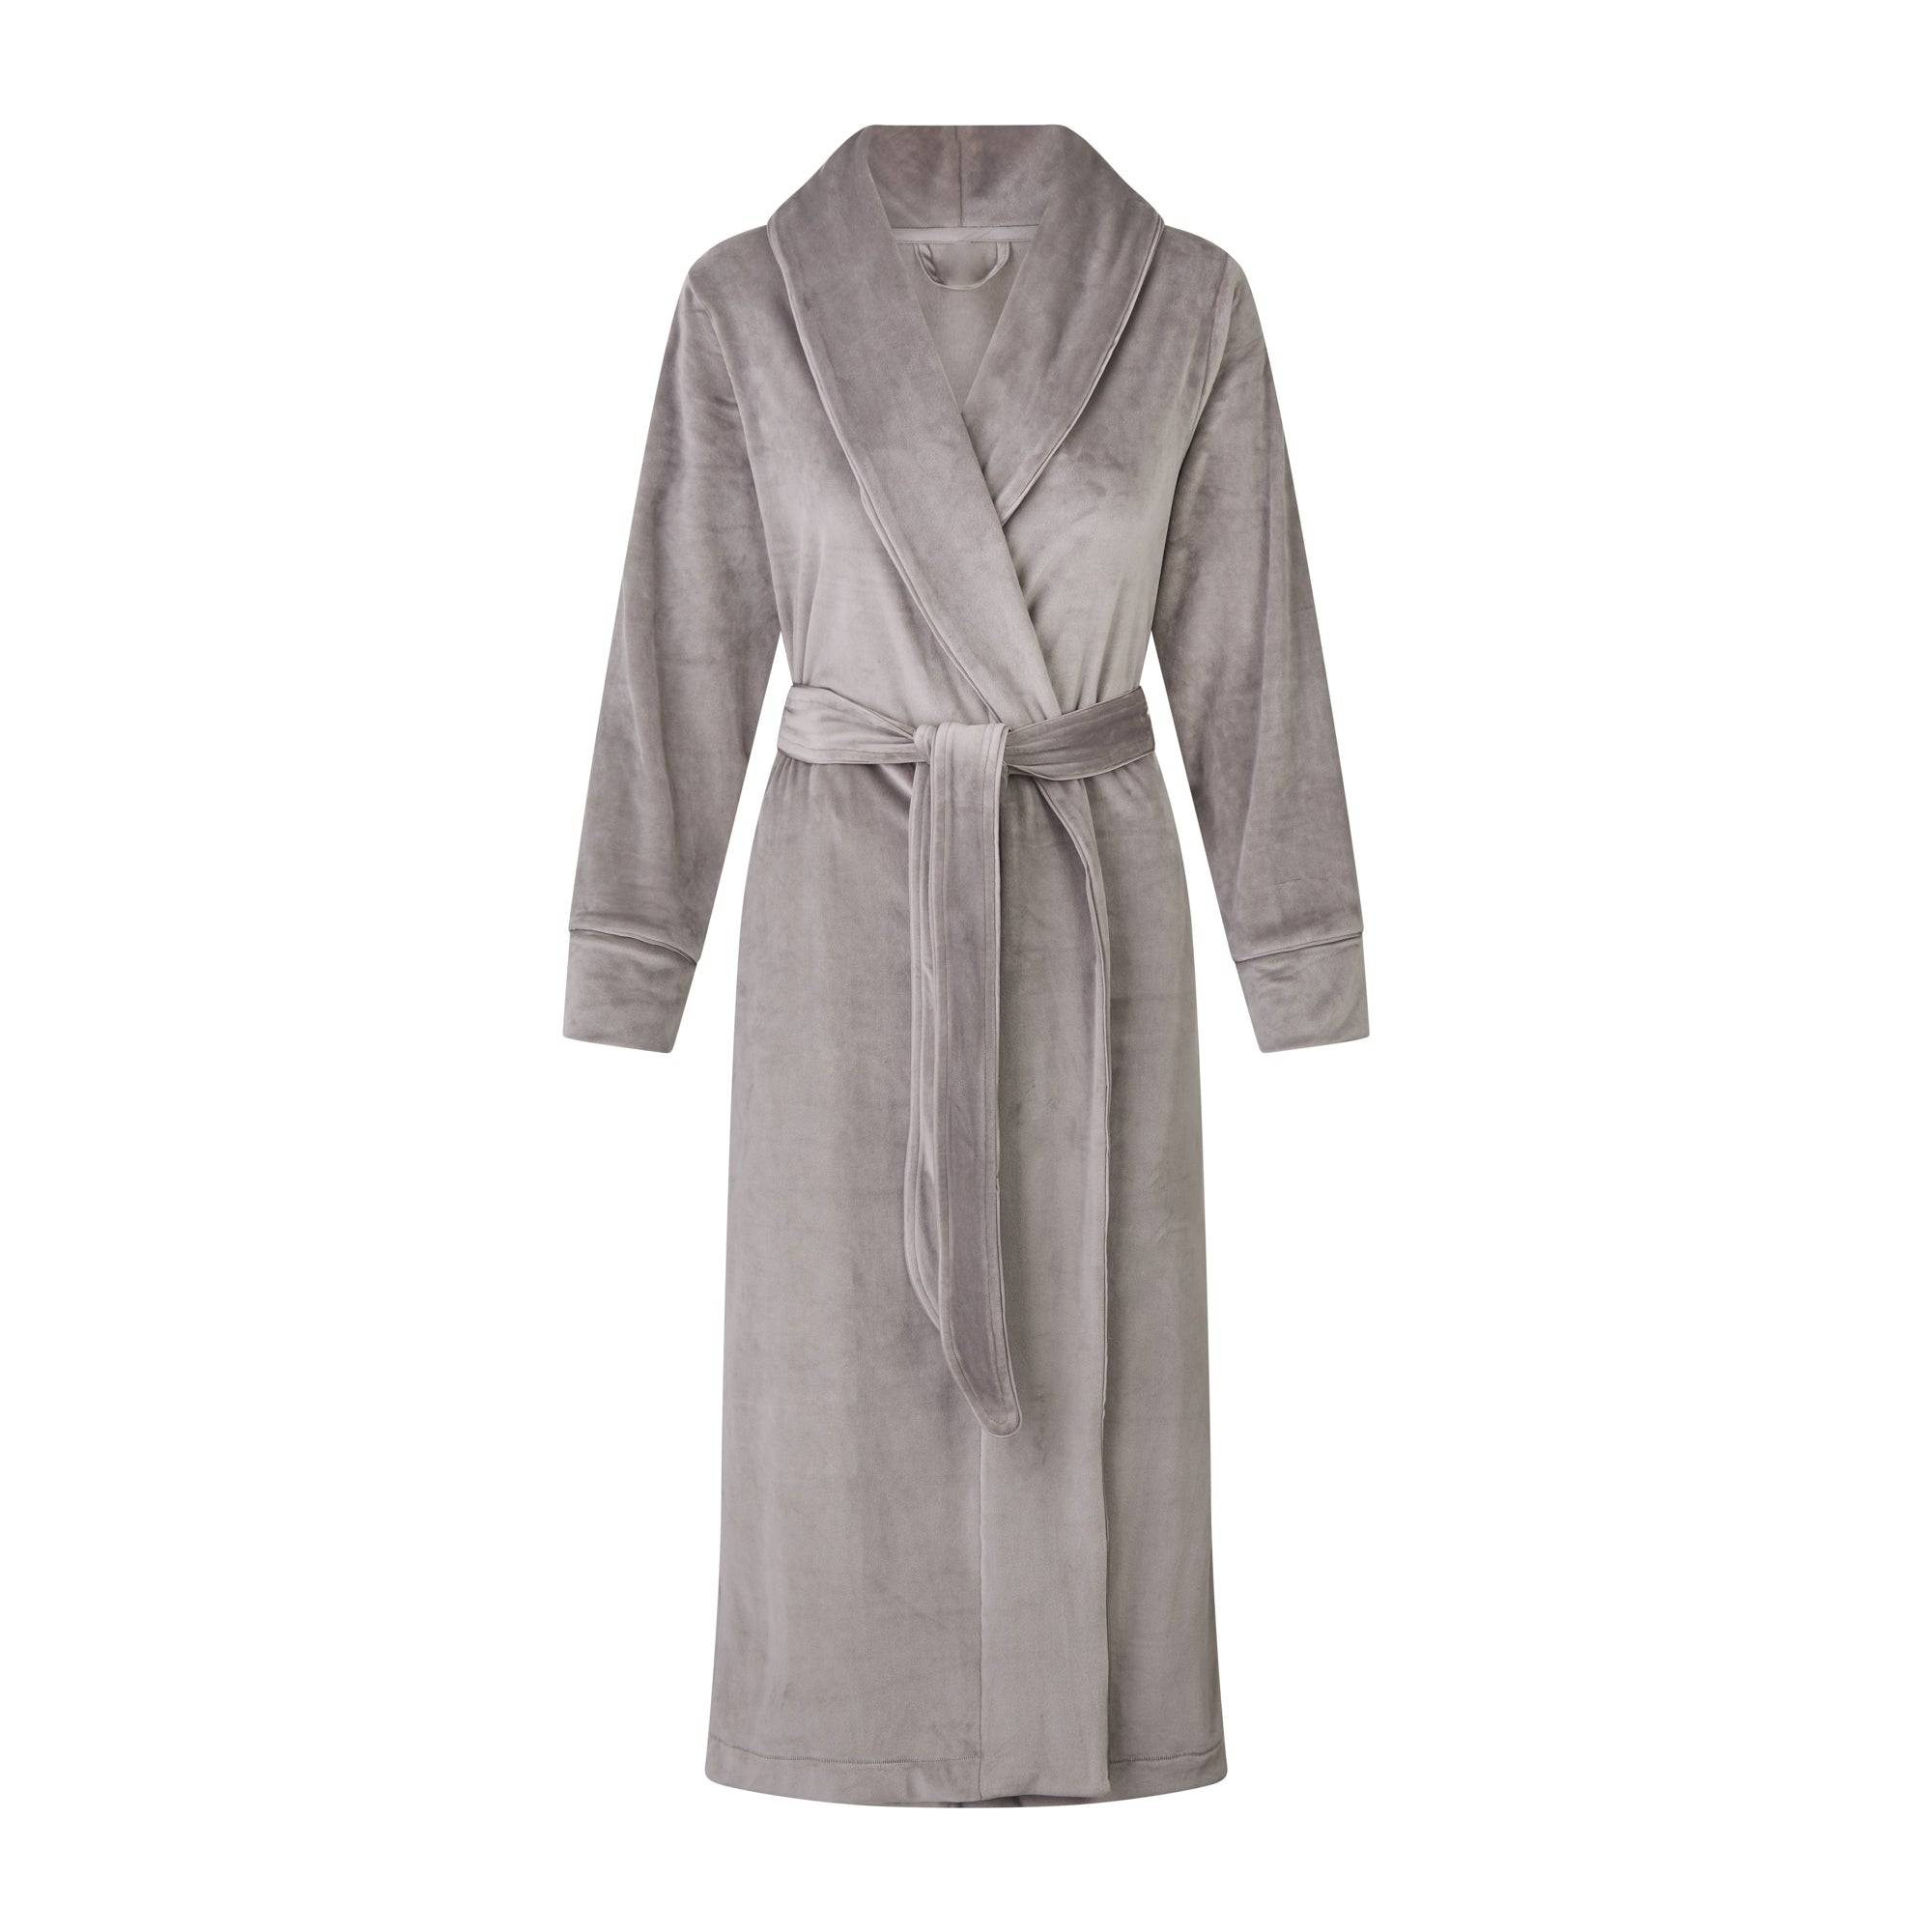 SKIMS Women's Velour Long Robe - Gray - Size XS; Gray